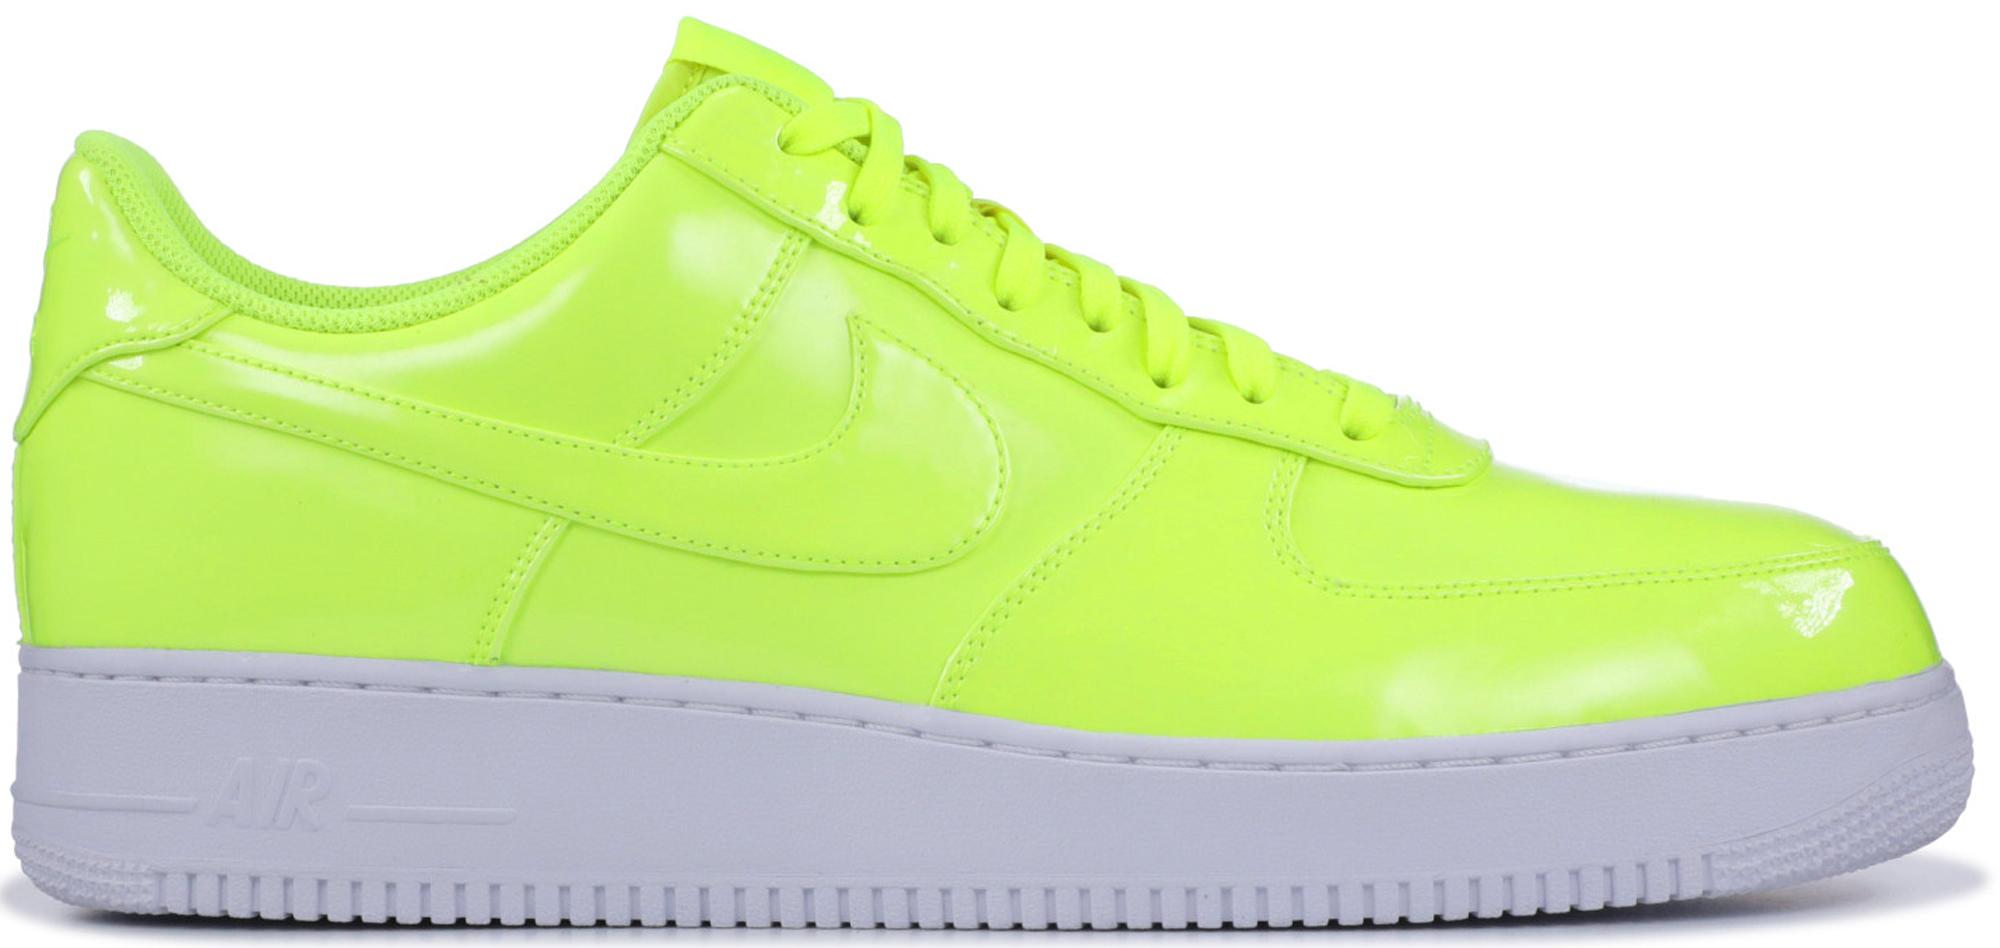 Nike Air Force 1 Low Ultraviolet Volt